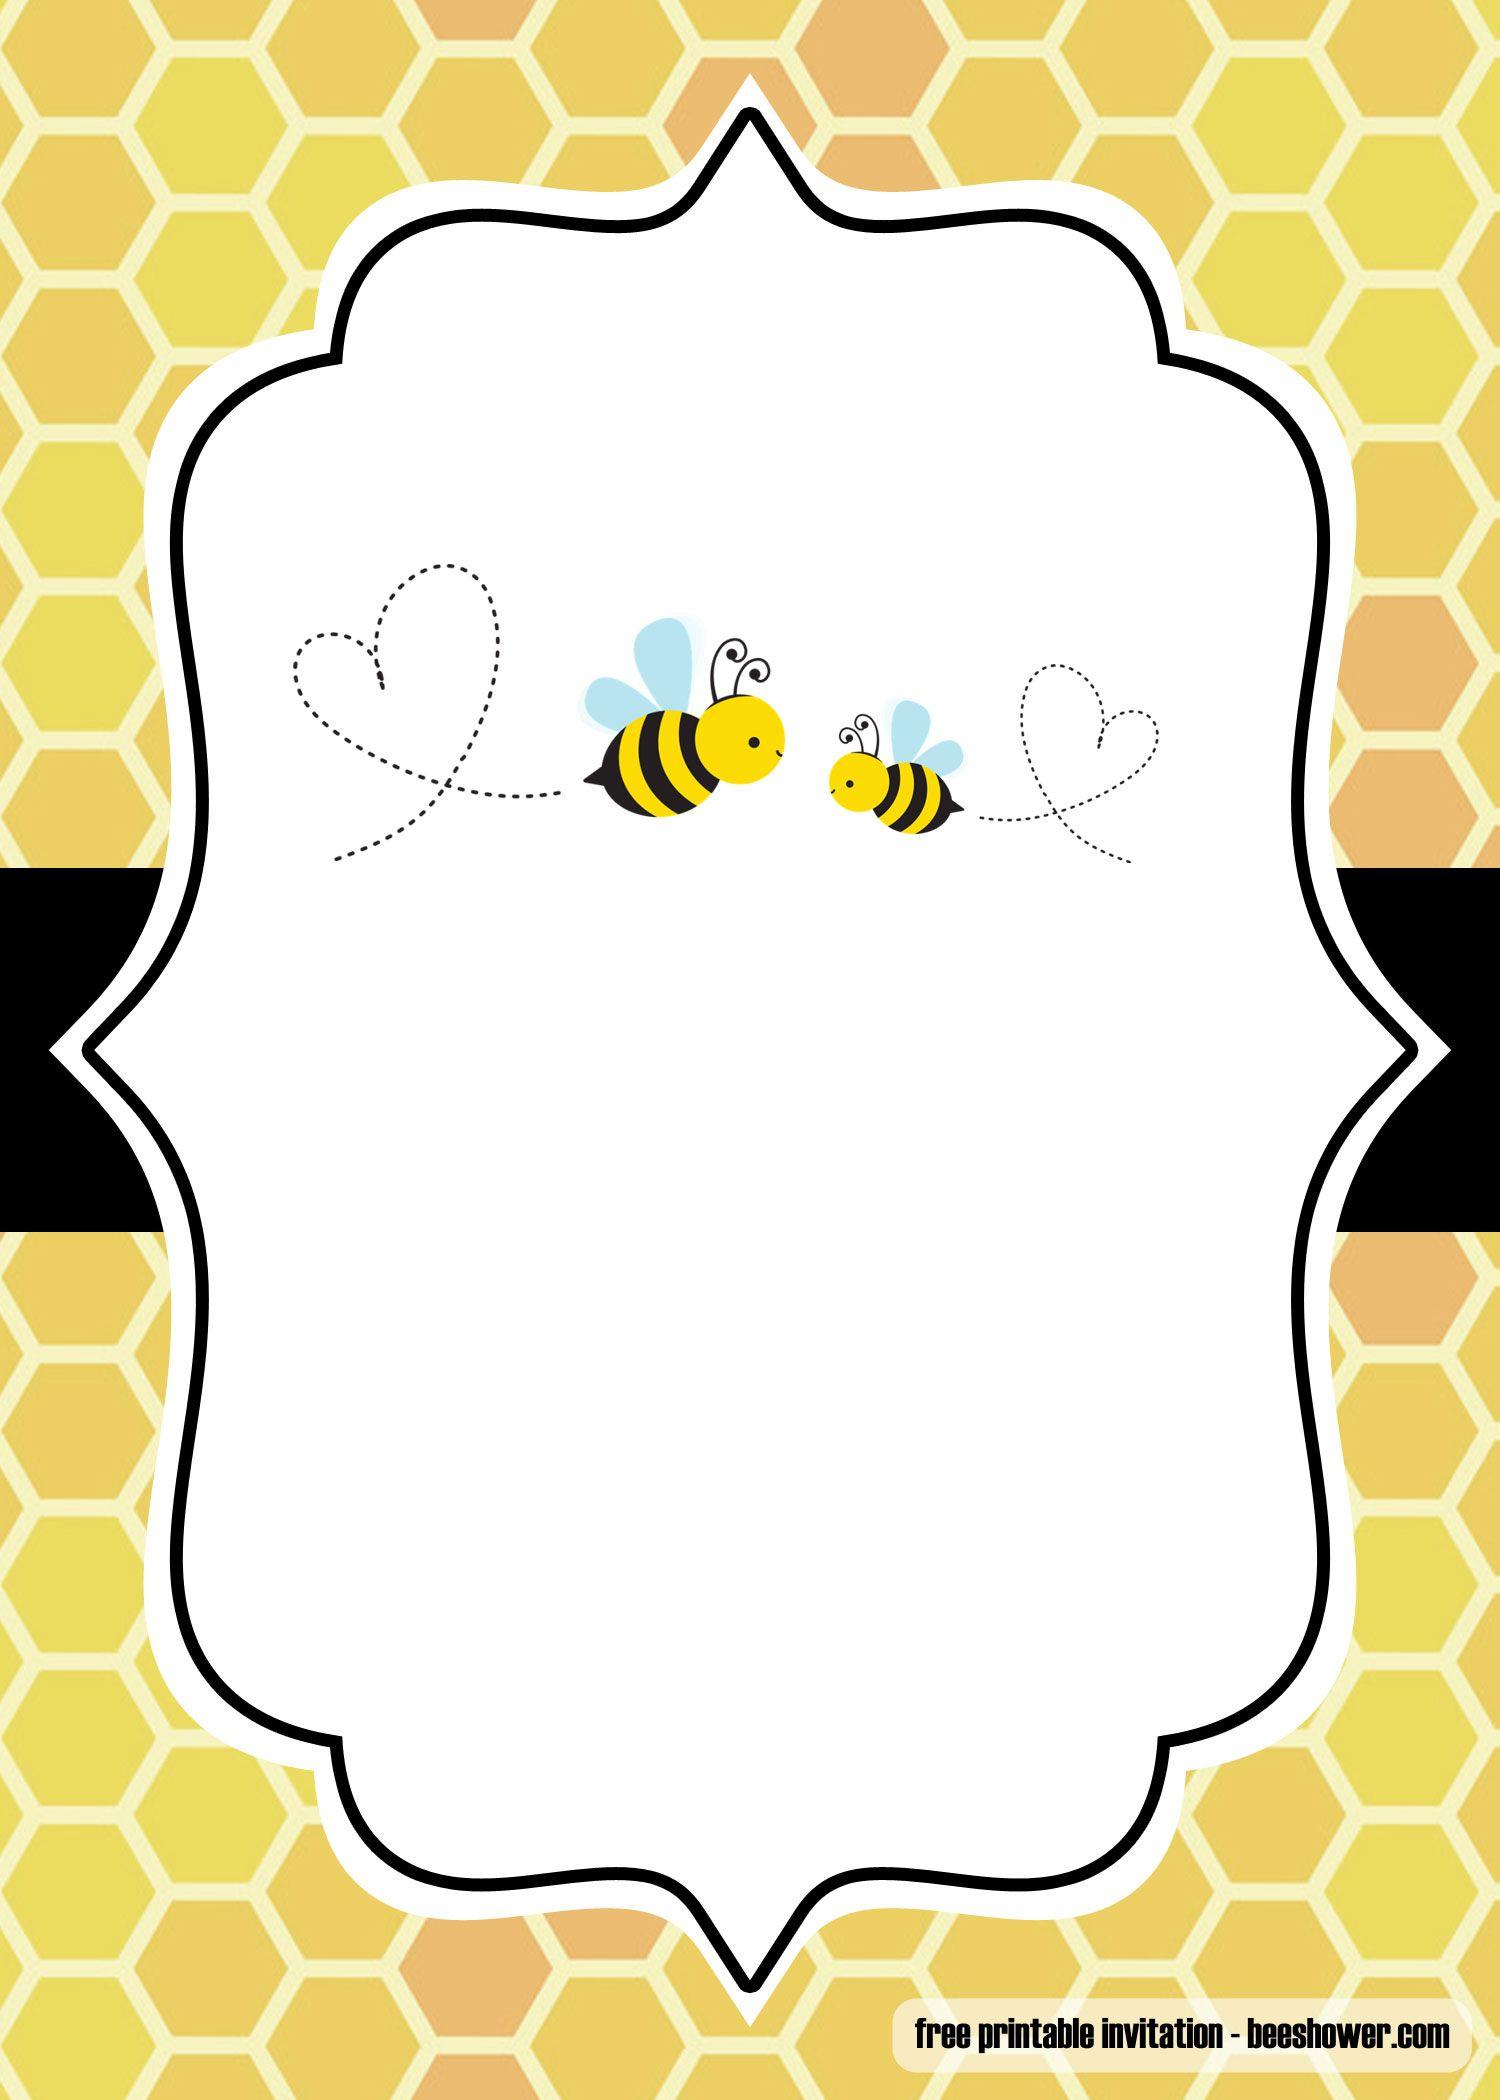 Free Printable Bumblebee Baby Shower Invitations Bumble Bee Baby Shower Invitation Bee Baby Shower Invitations Bee Invitations